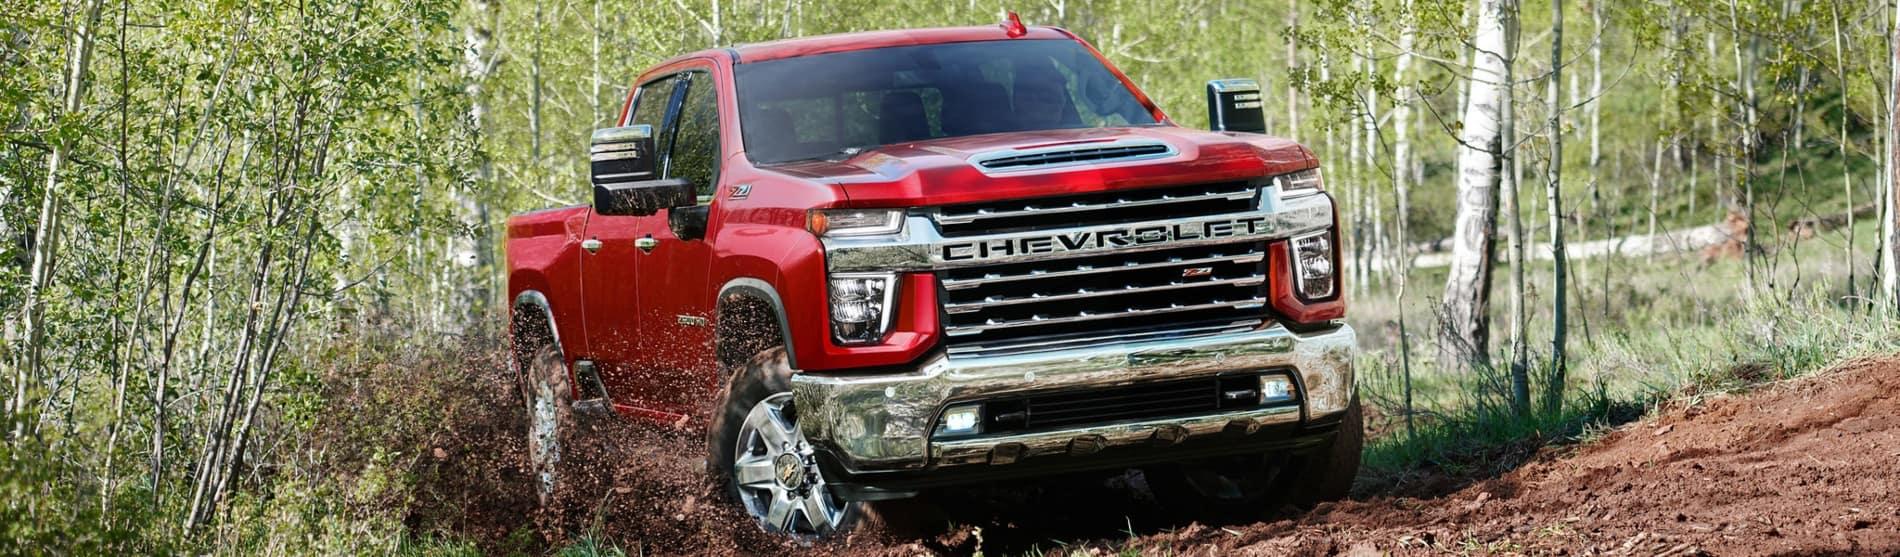 2021 Chevrolet Silverado HD Spotlight | Delaware, OH